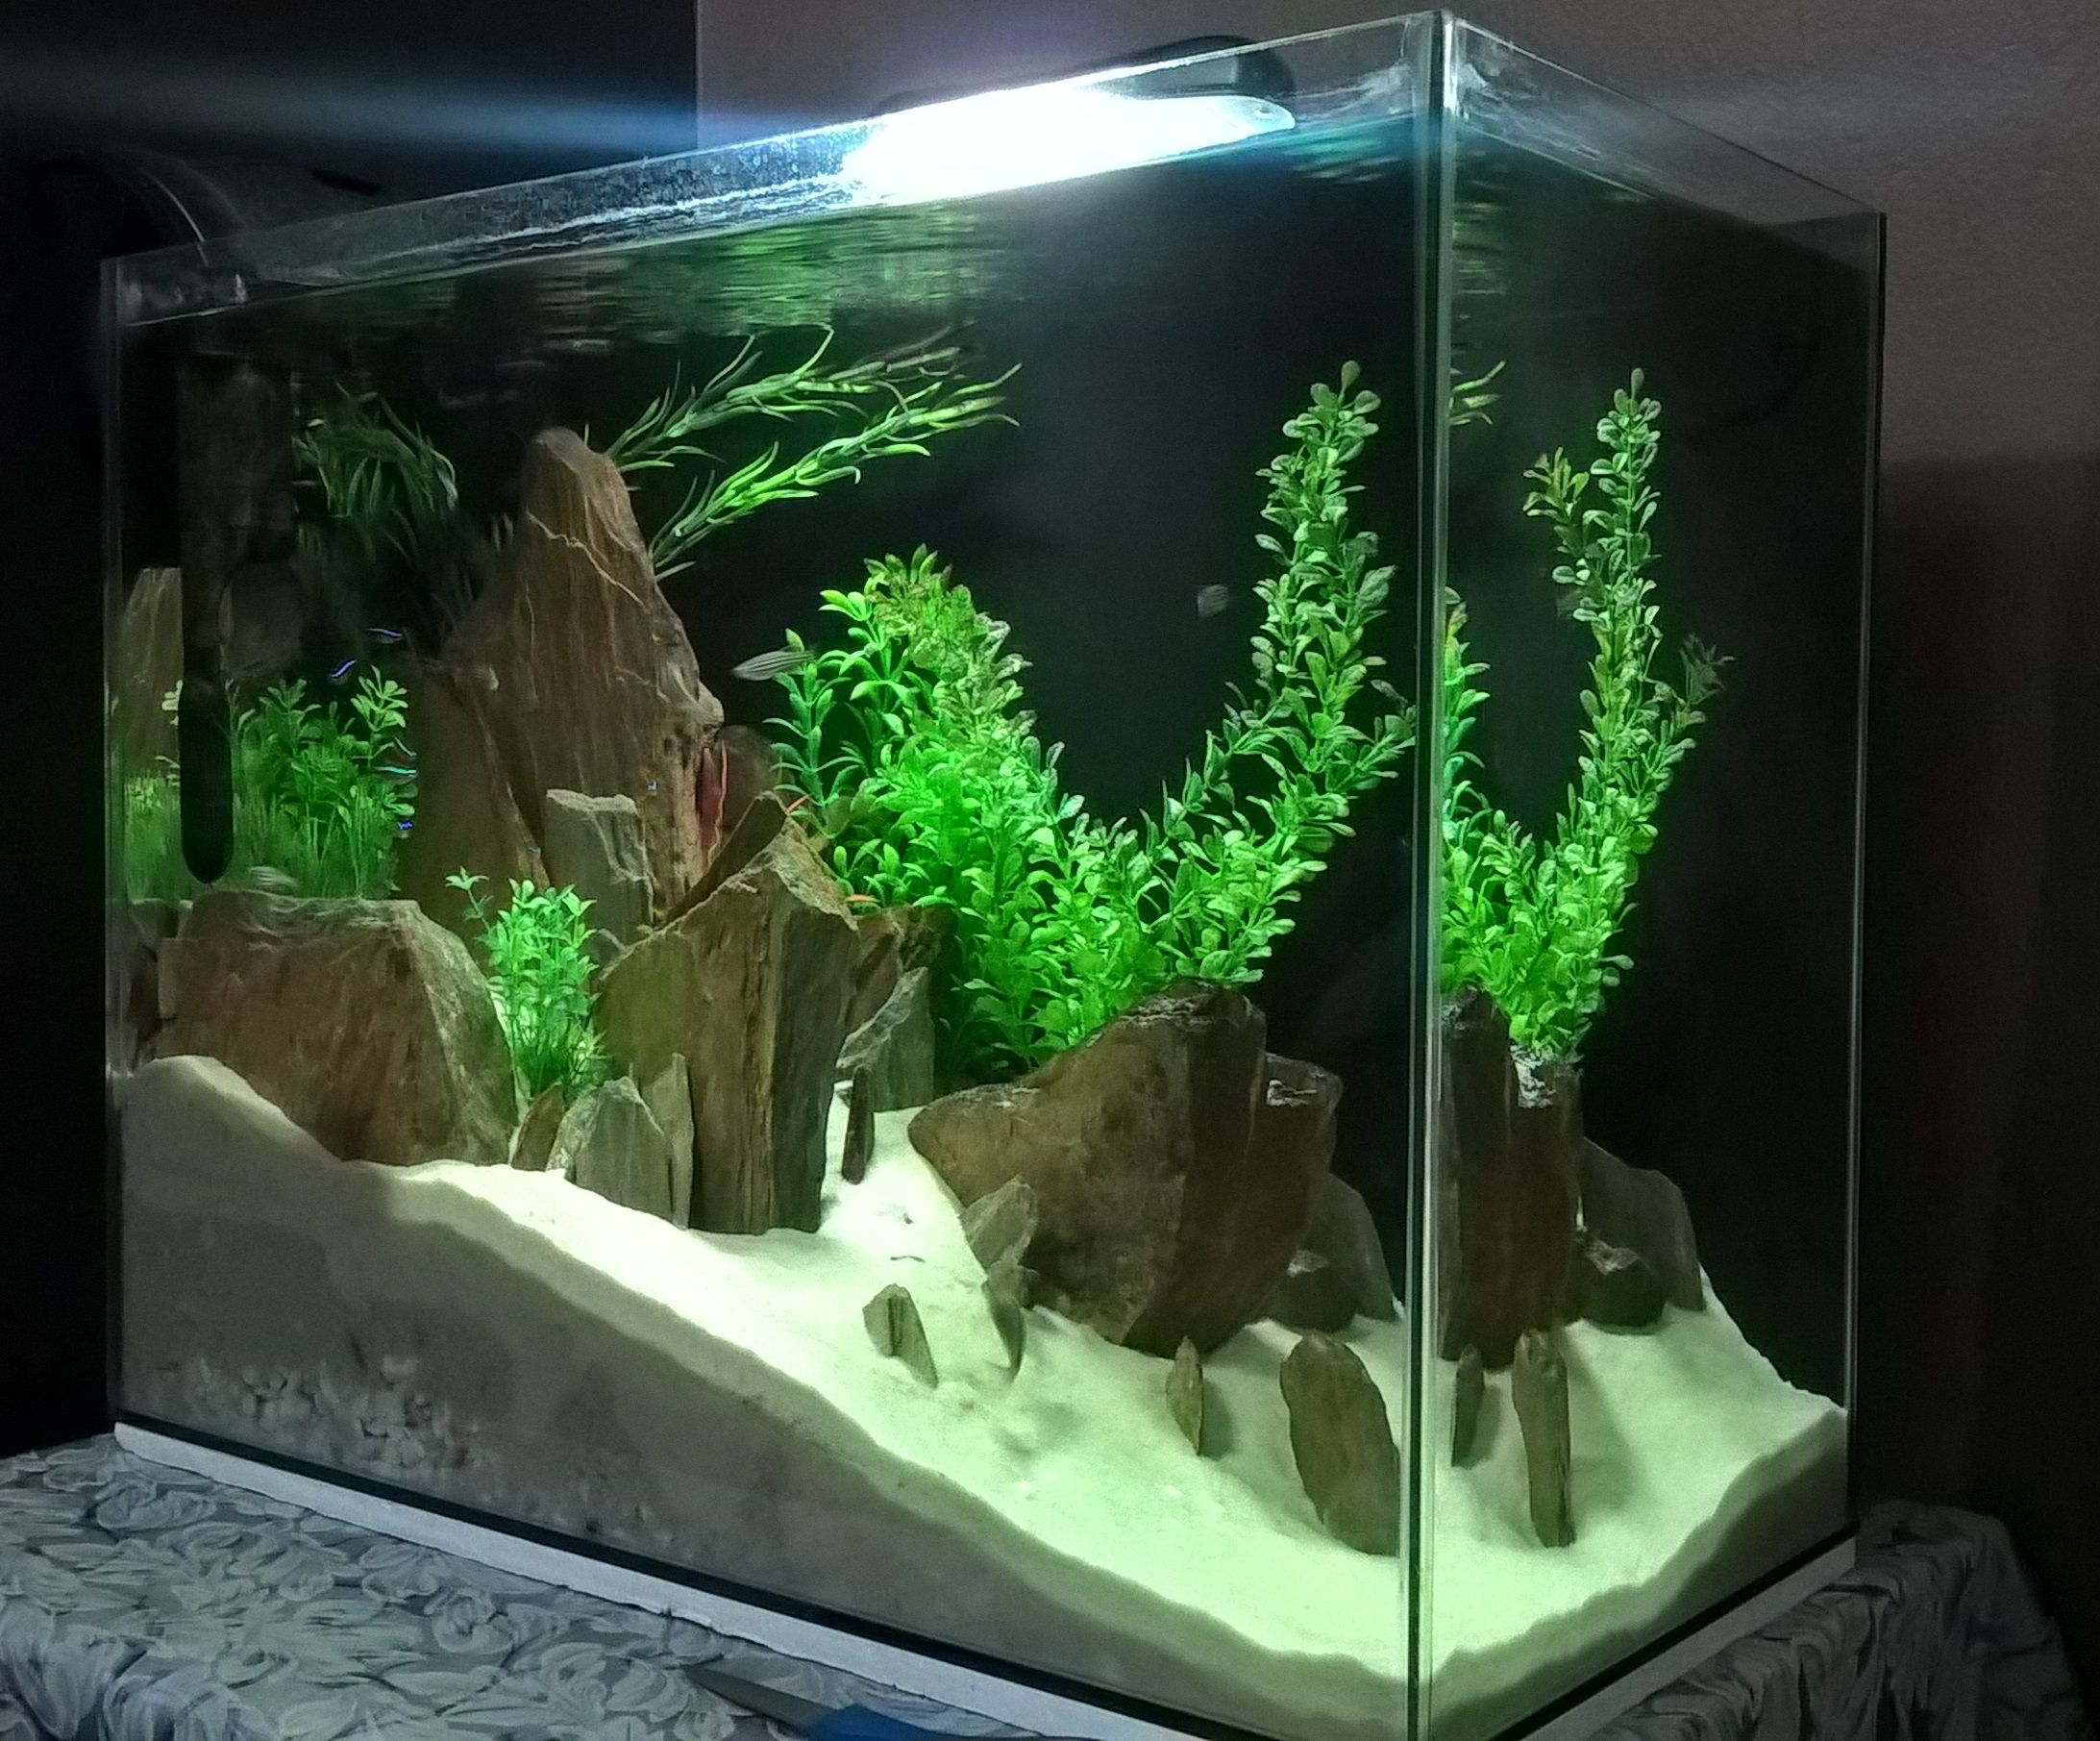 Frais De Plante Pour Aquarium Concept